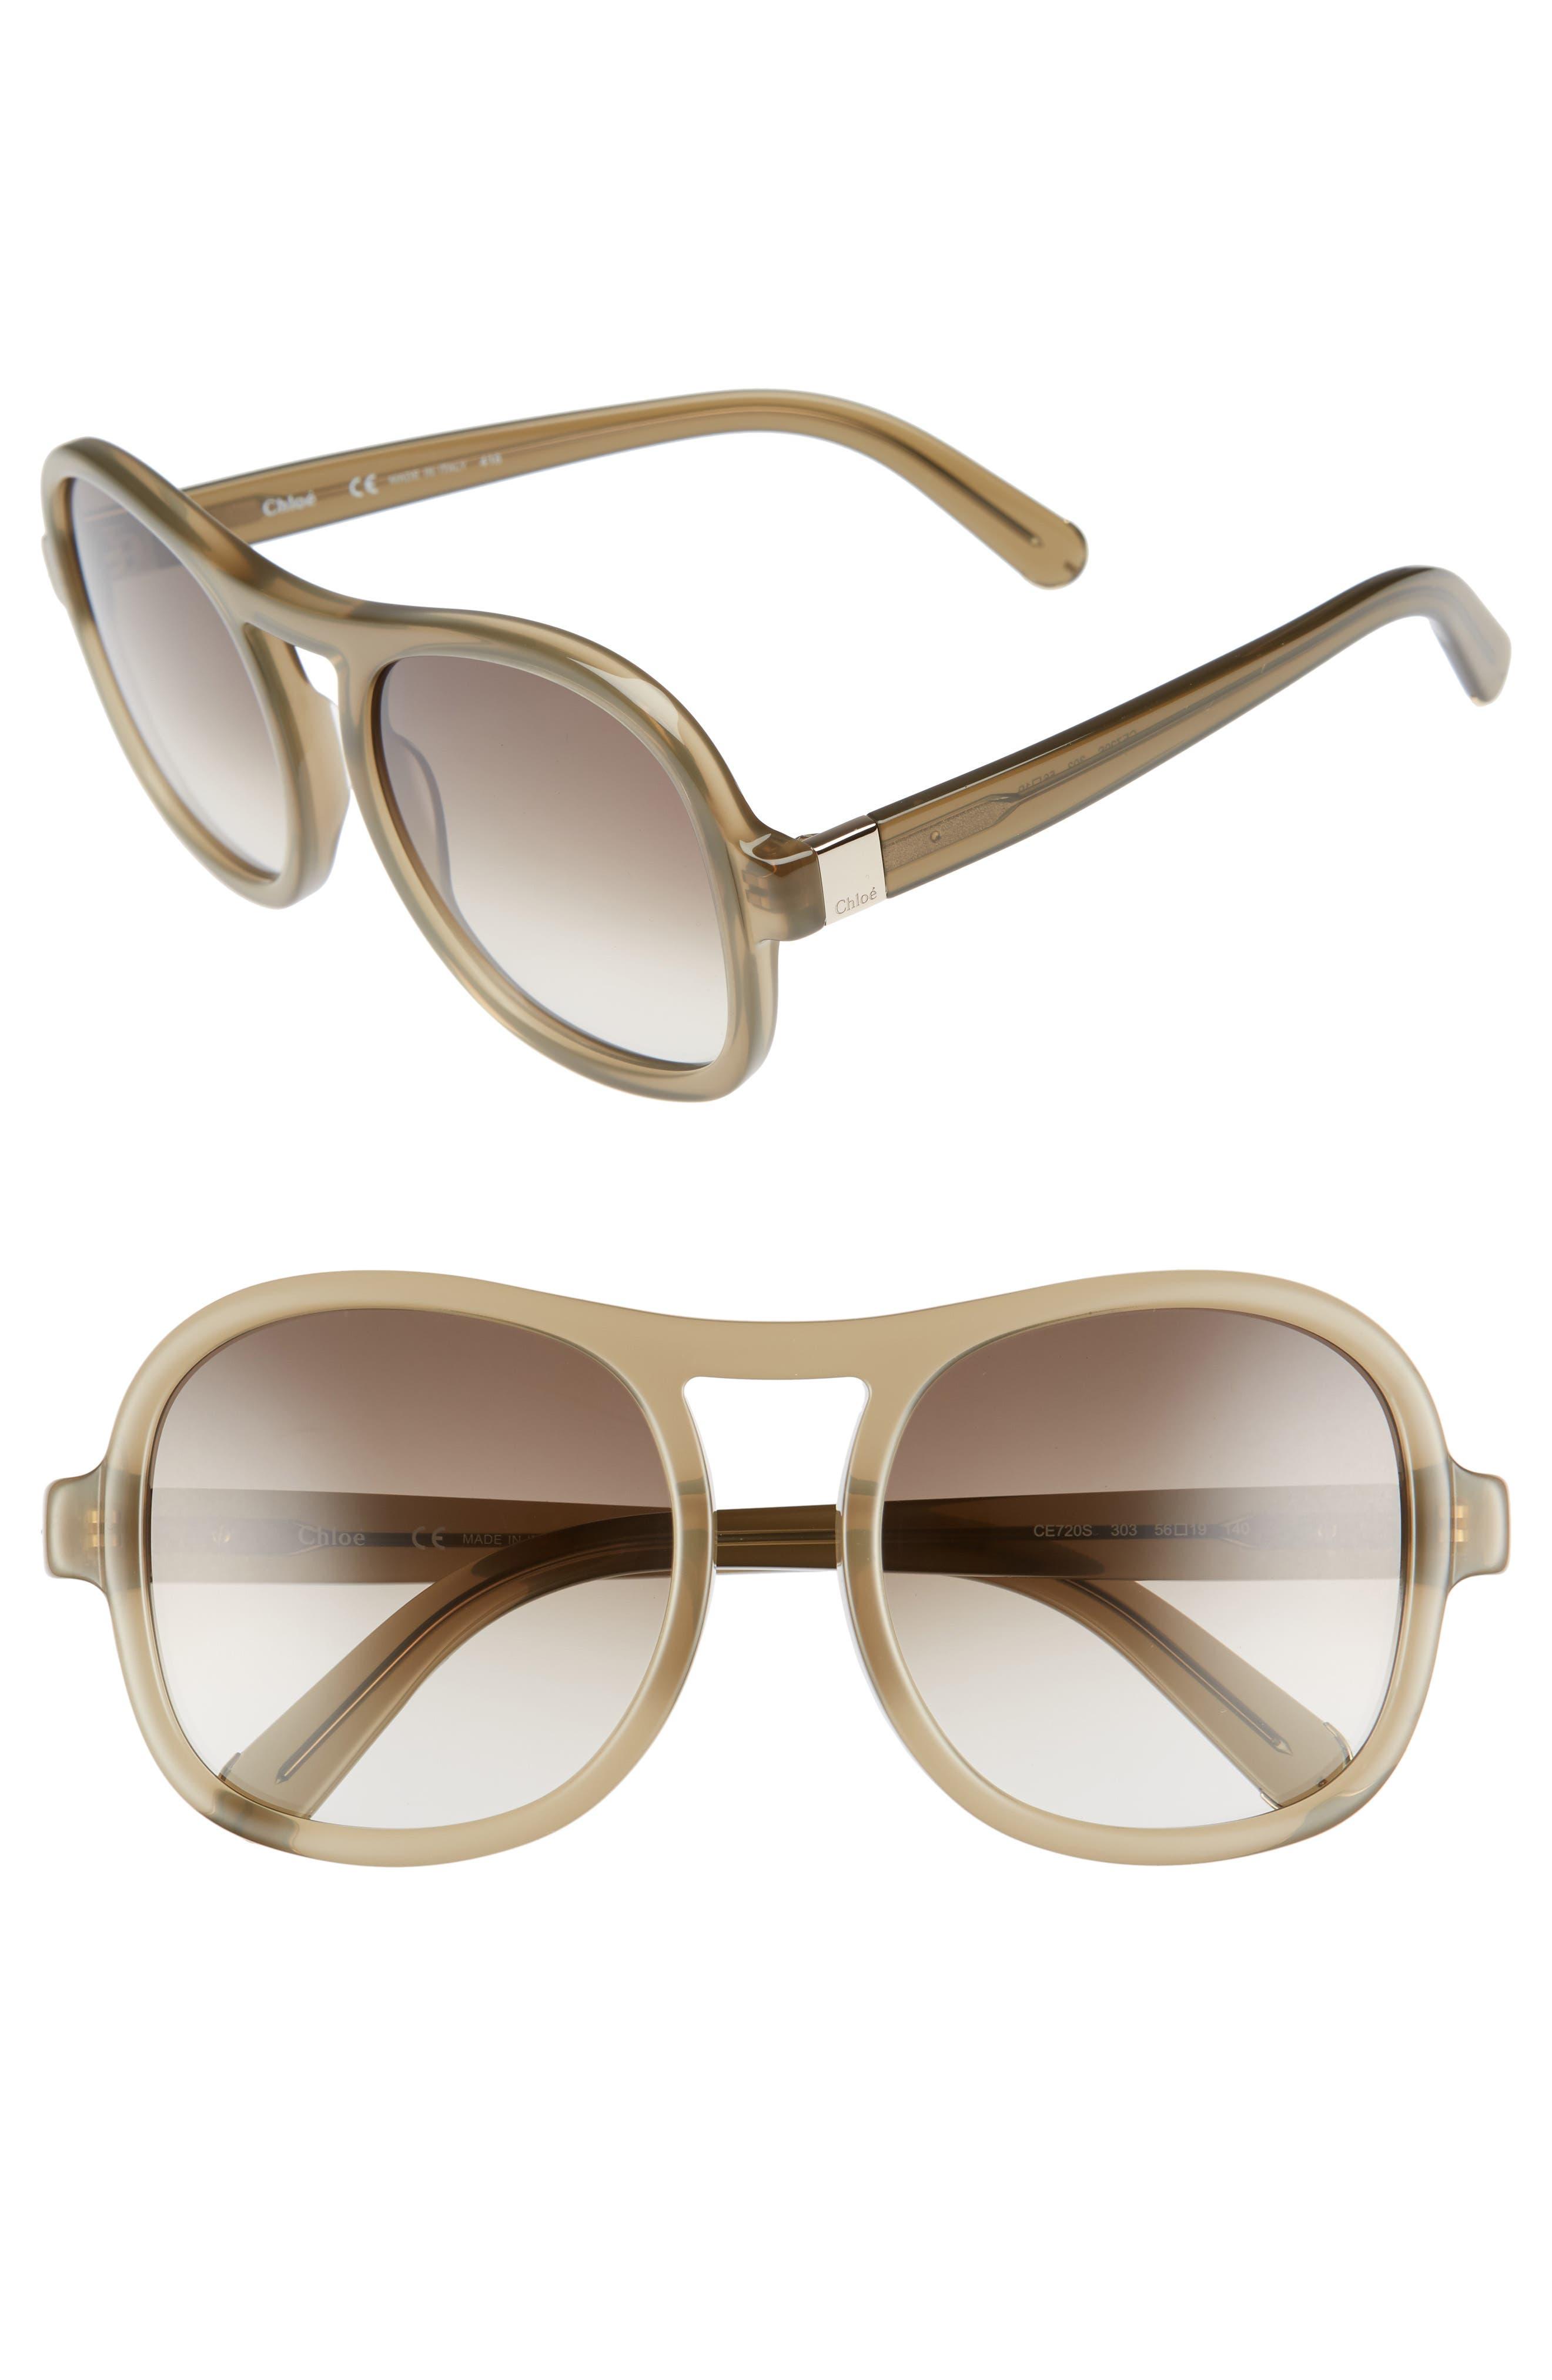 Marlow 56mm Gradient Lens Sunglasses,                             Main thumbnail 1, color,                             Khaki